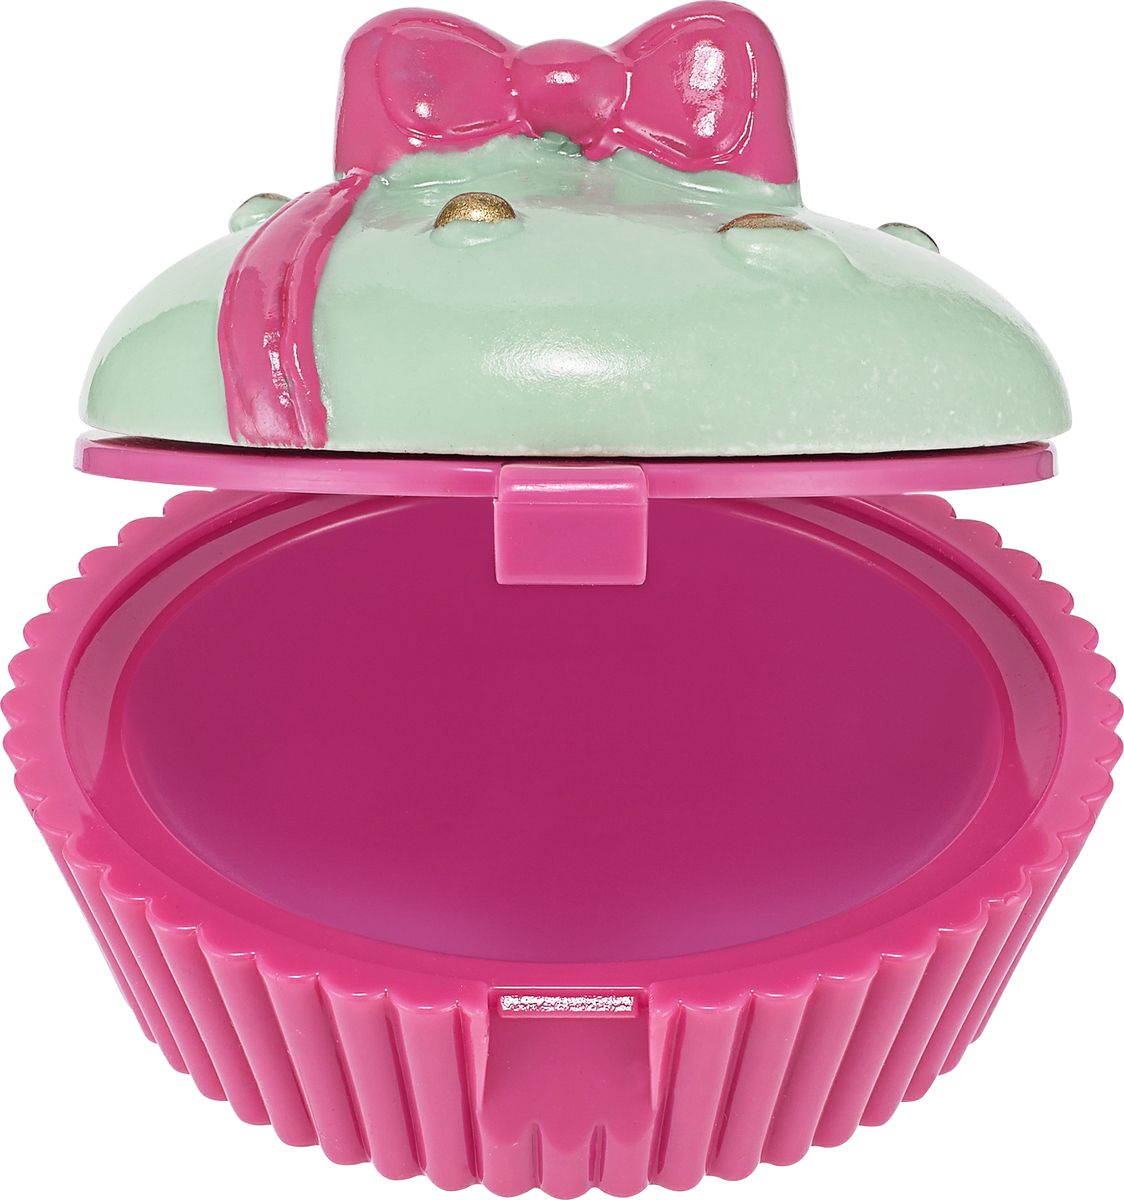 Holika Holika Бальзам для губ Дессерт тайм, тон 02, розовое пирожное, 7 гFS-008976644 Holika Holika Dessert Time Lip Balm AD02 (Pink Cup Cake) Бальзам для губ Время десерта (Розовое пирожное).